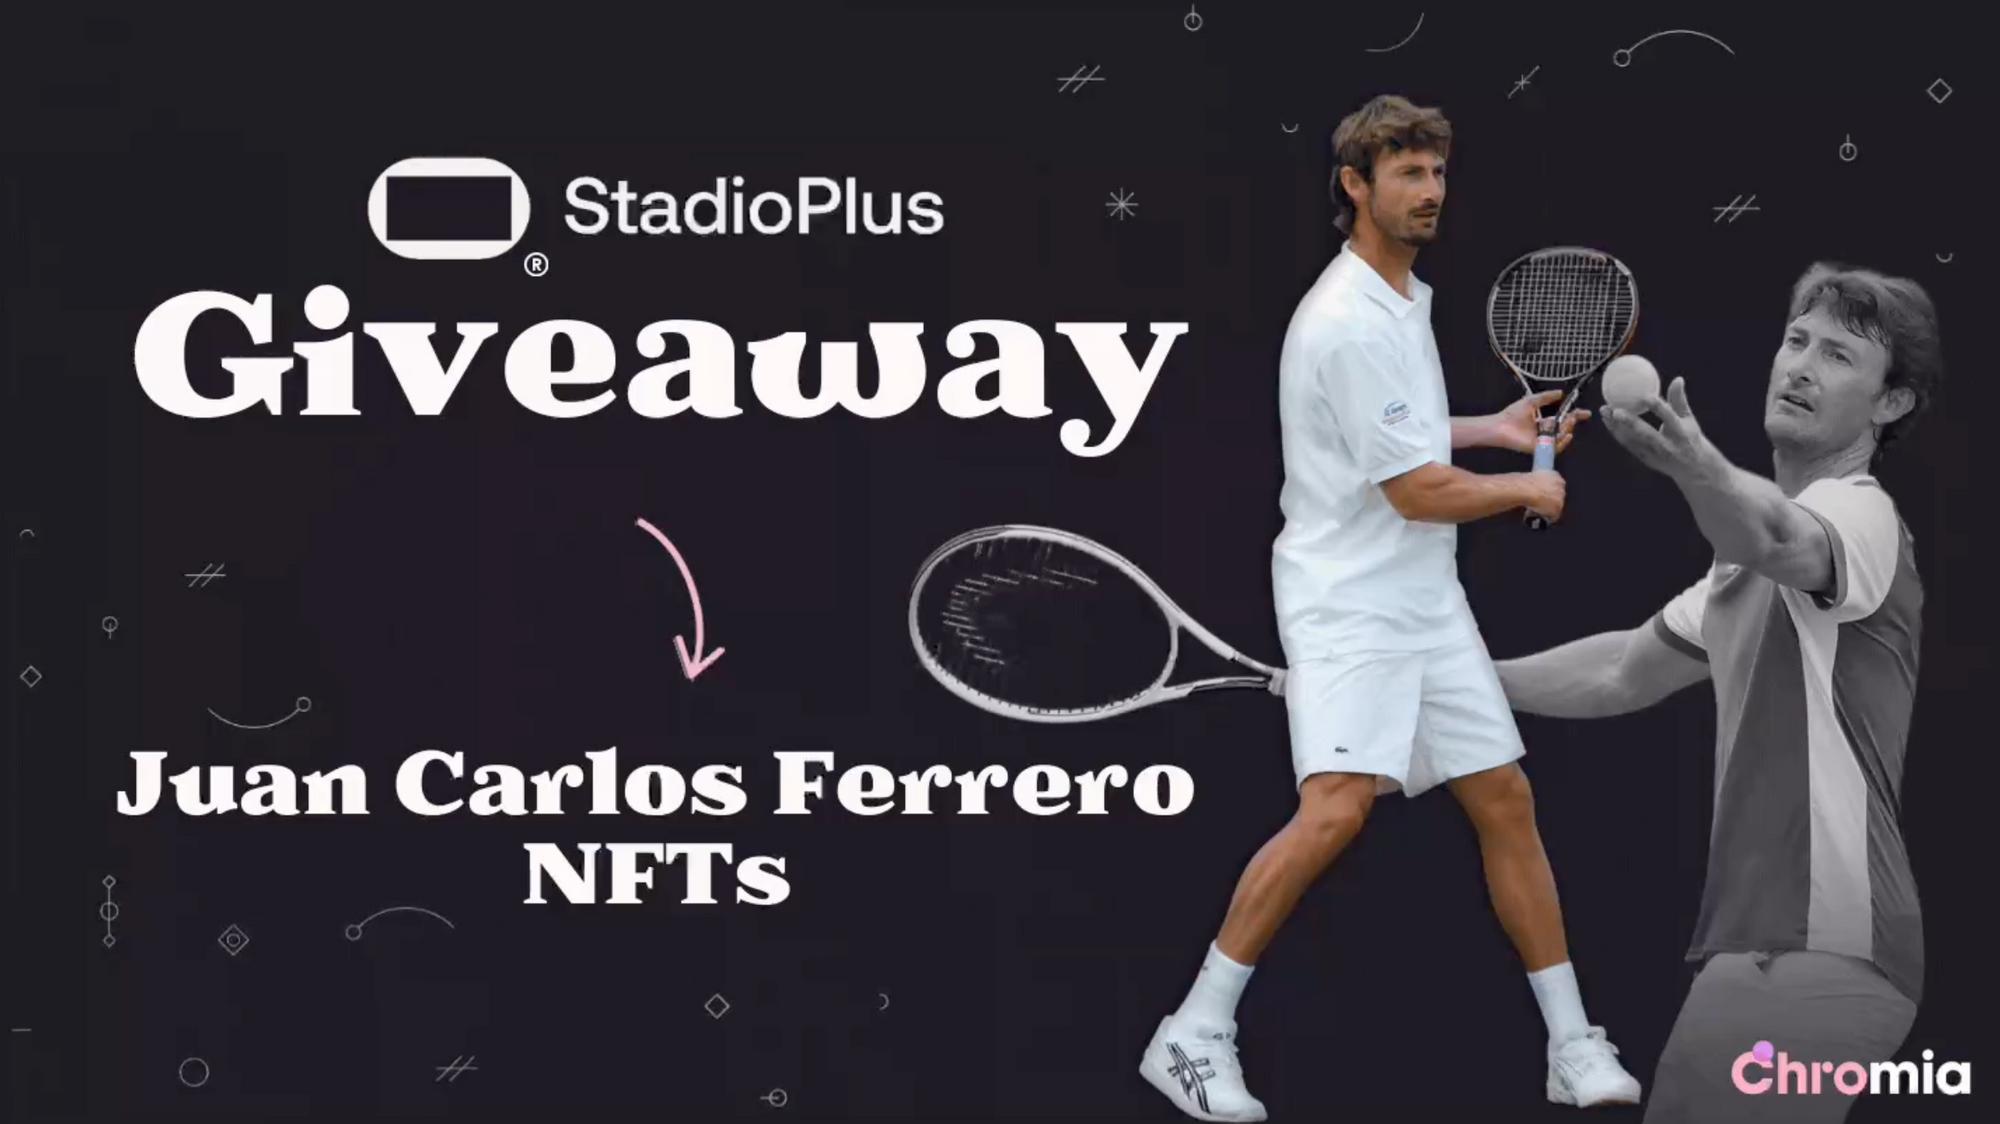 Win Limited Edition Juan Carlos Ferrero NFTs!